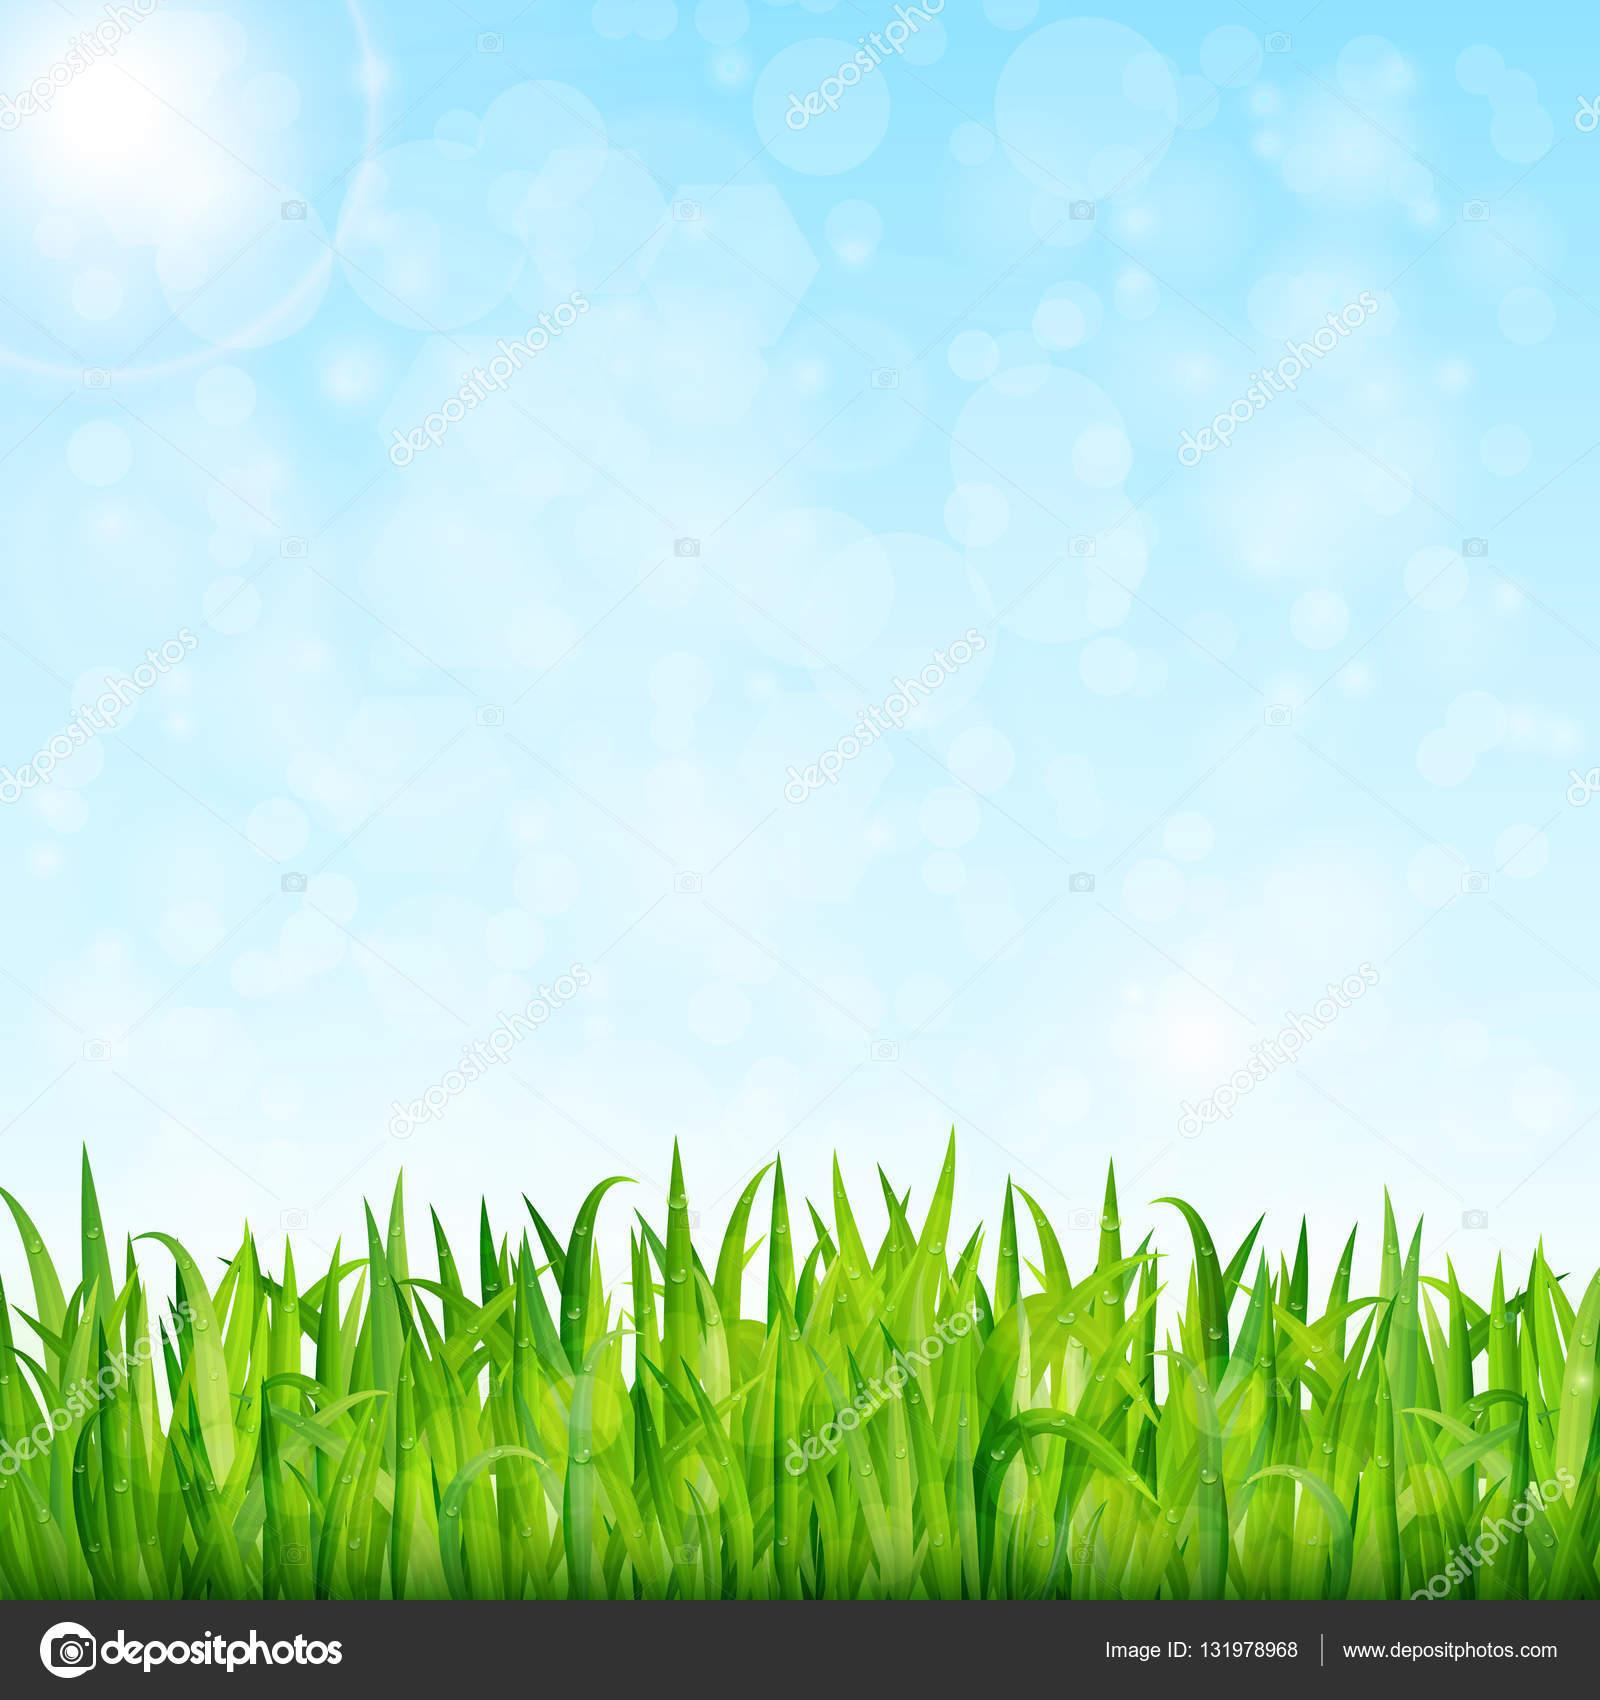 Yeşil çim Ve Mavi Gökyüzü Vektör Doğa Arka Plan Stok Vektör